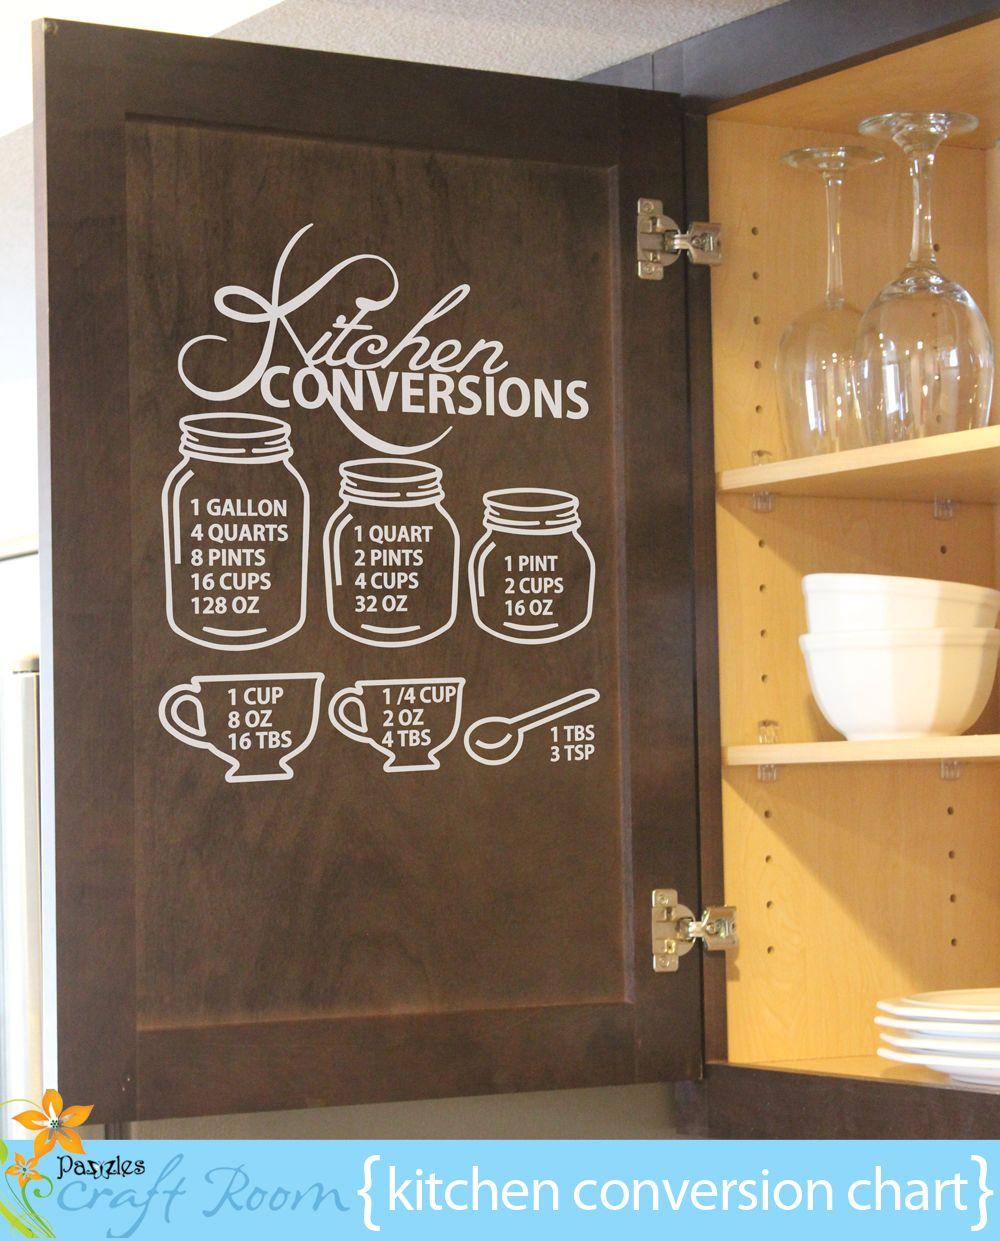 Kitchen Conversion Chart Pazzles Craft Room Conversion Chart Kitchen Kitchen Conversion Kitchen Measurements